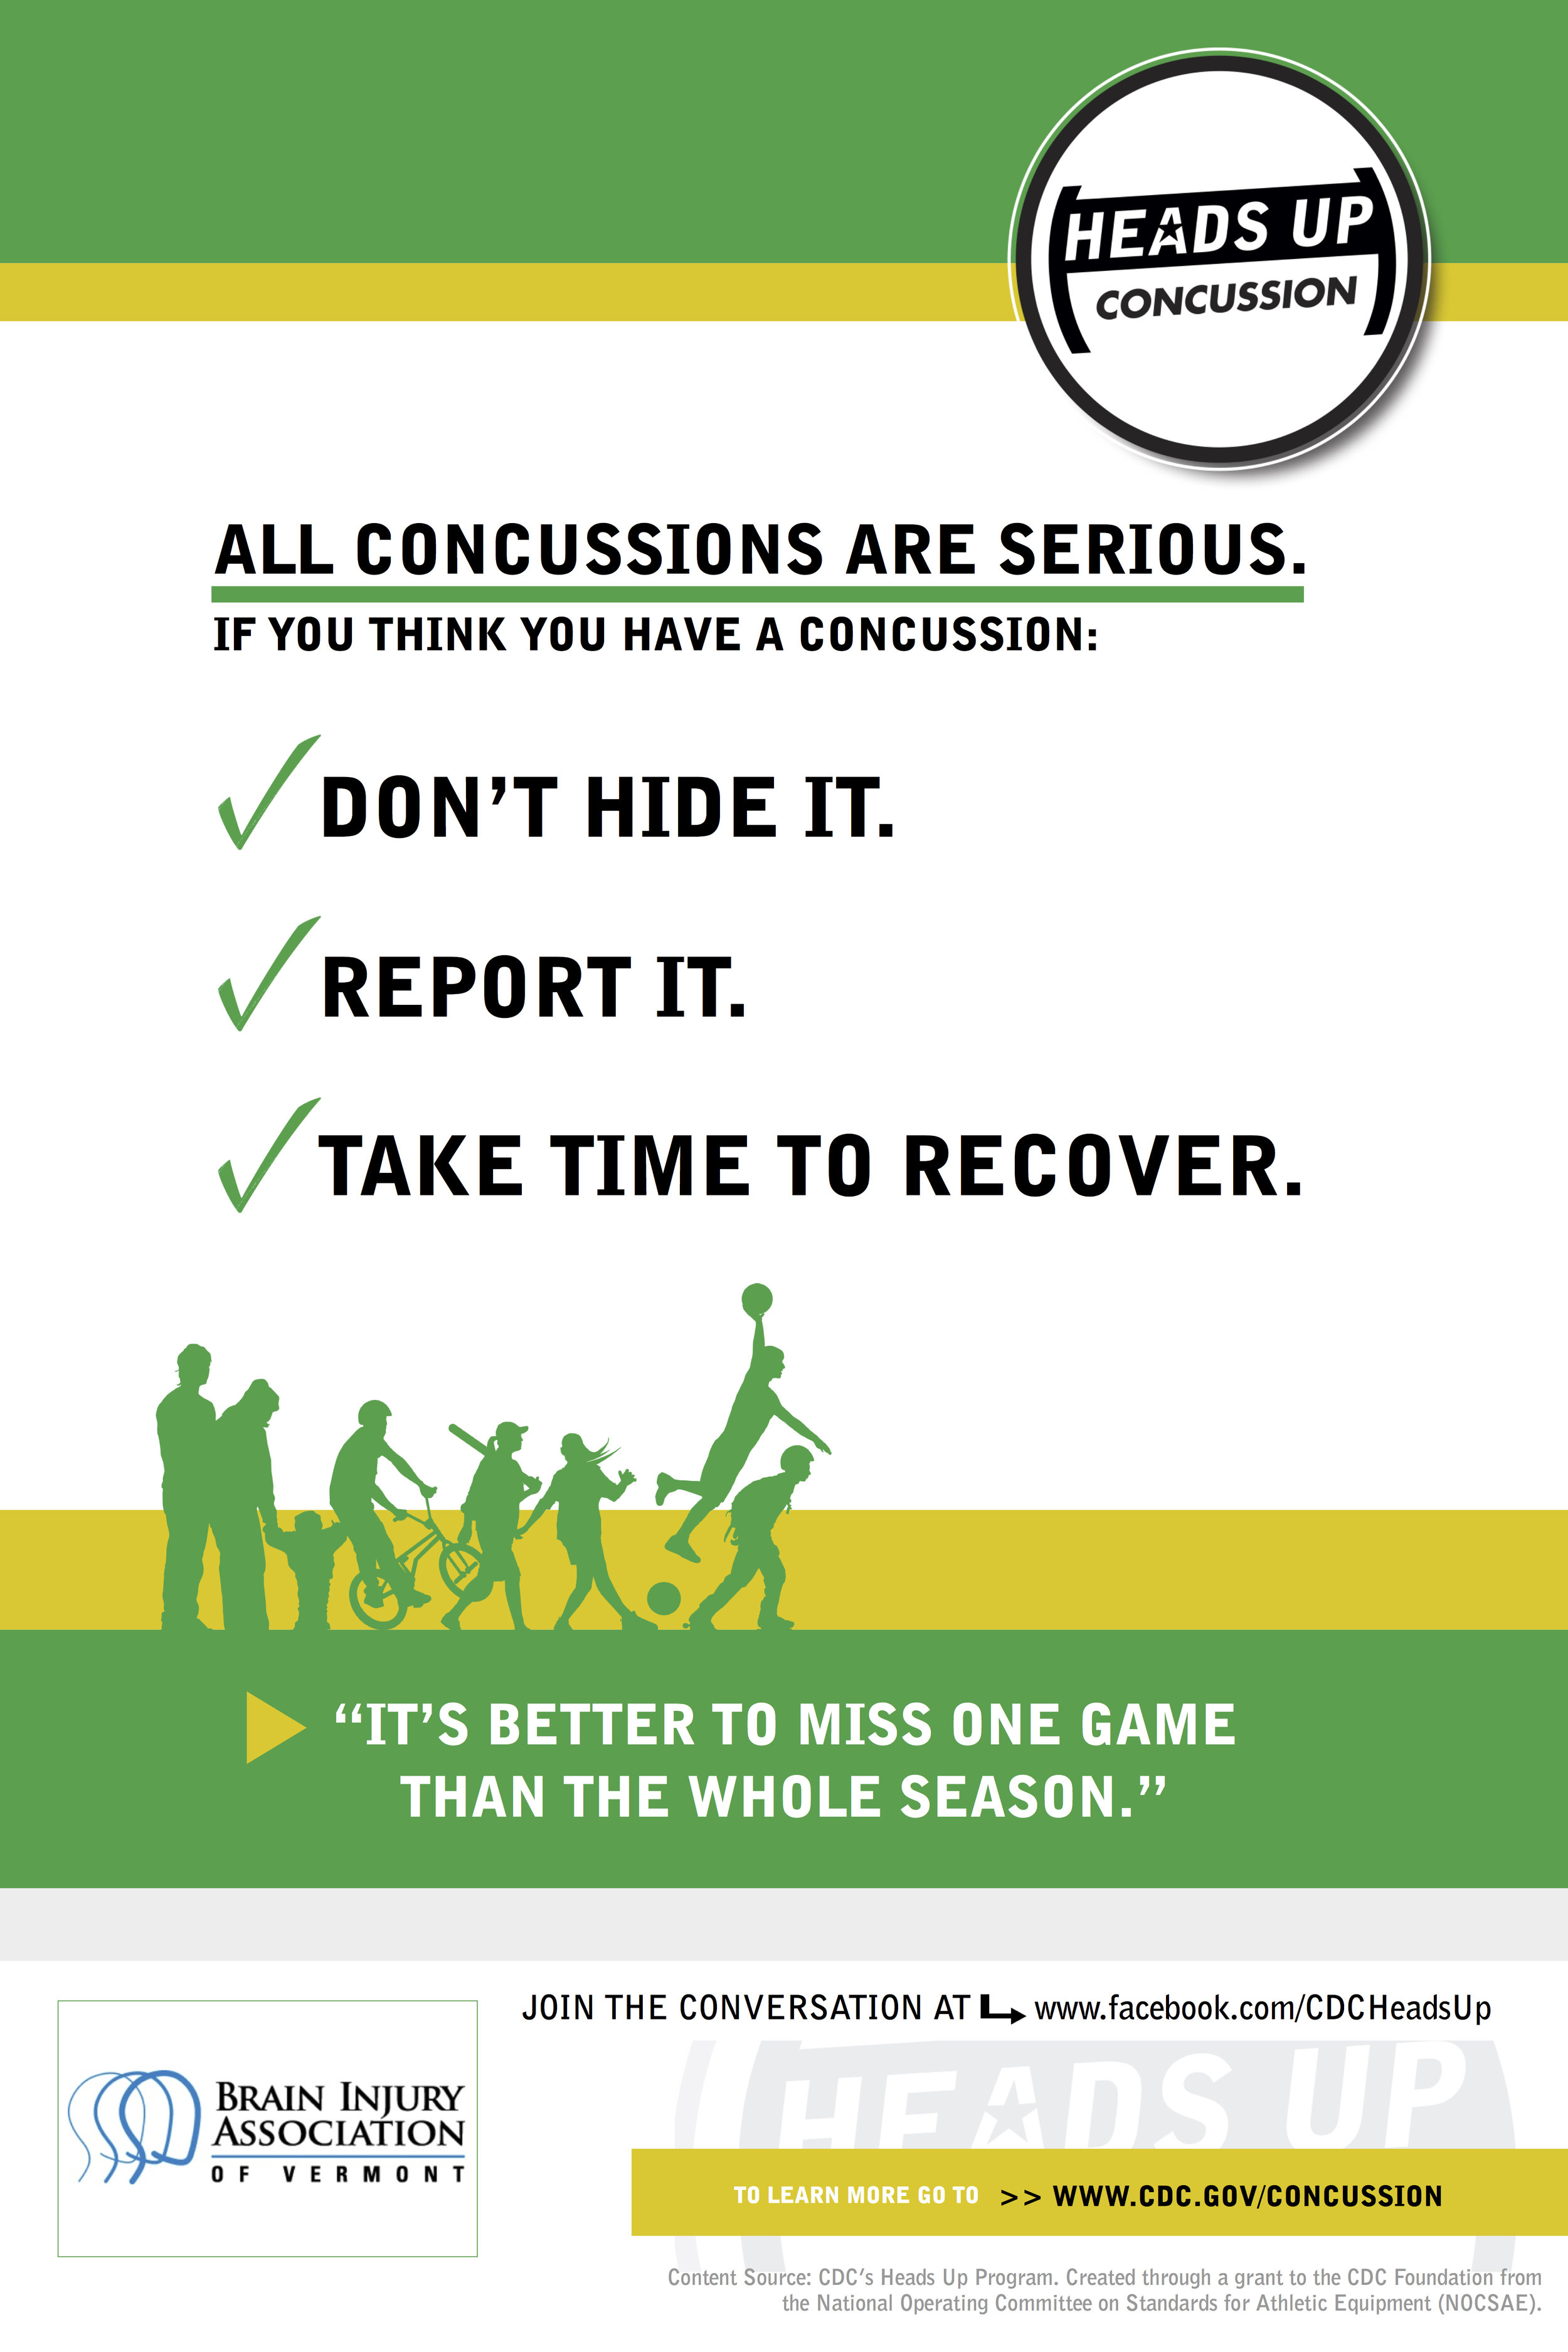 CDC_HeadsUpConcussion_Poster.jpg